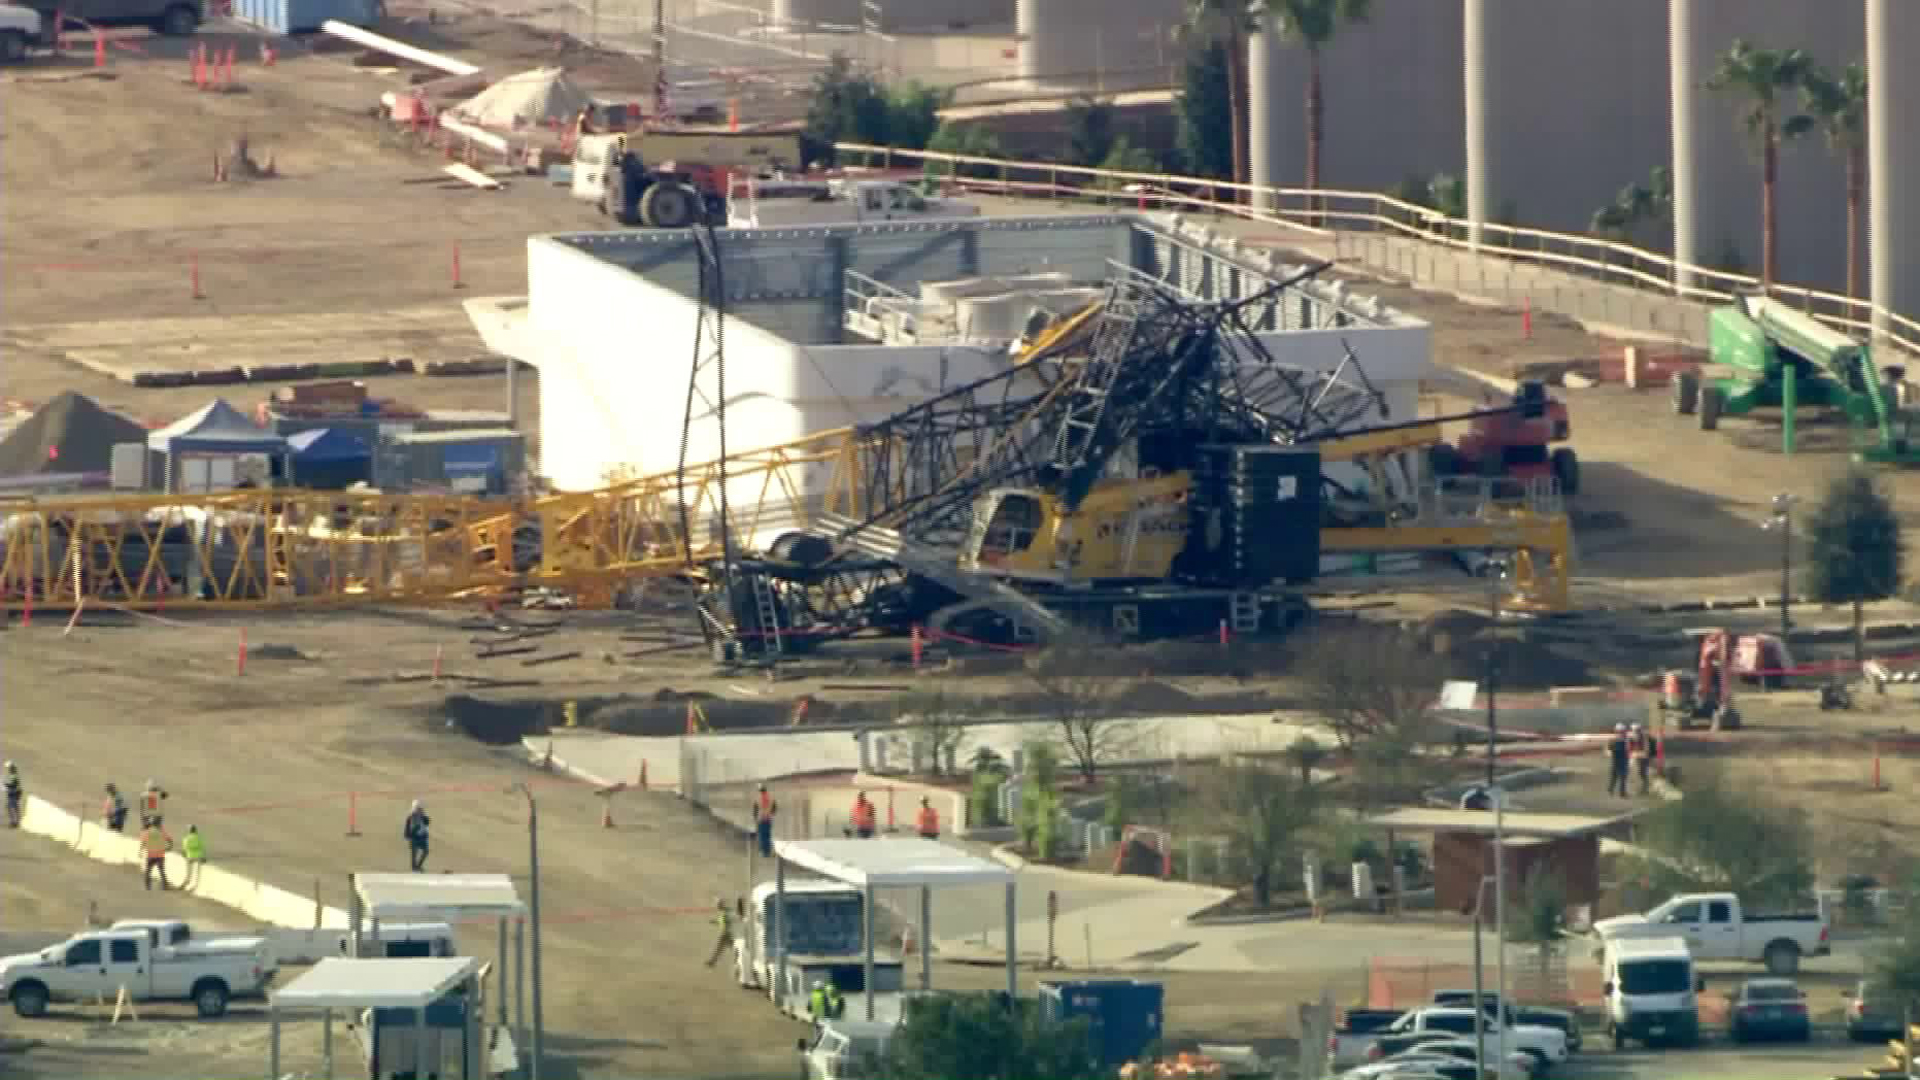 A crane collapsed outside the under-construction SoFi Stadium in Inglewood on Feb. 28, 2020. (Credit: KTLA)